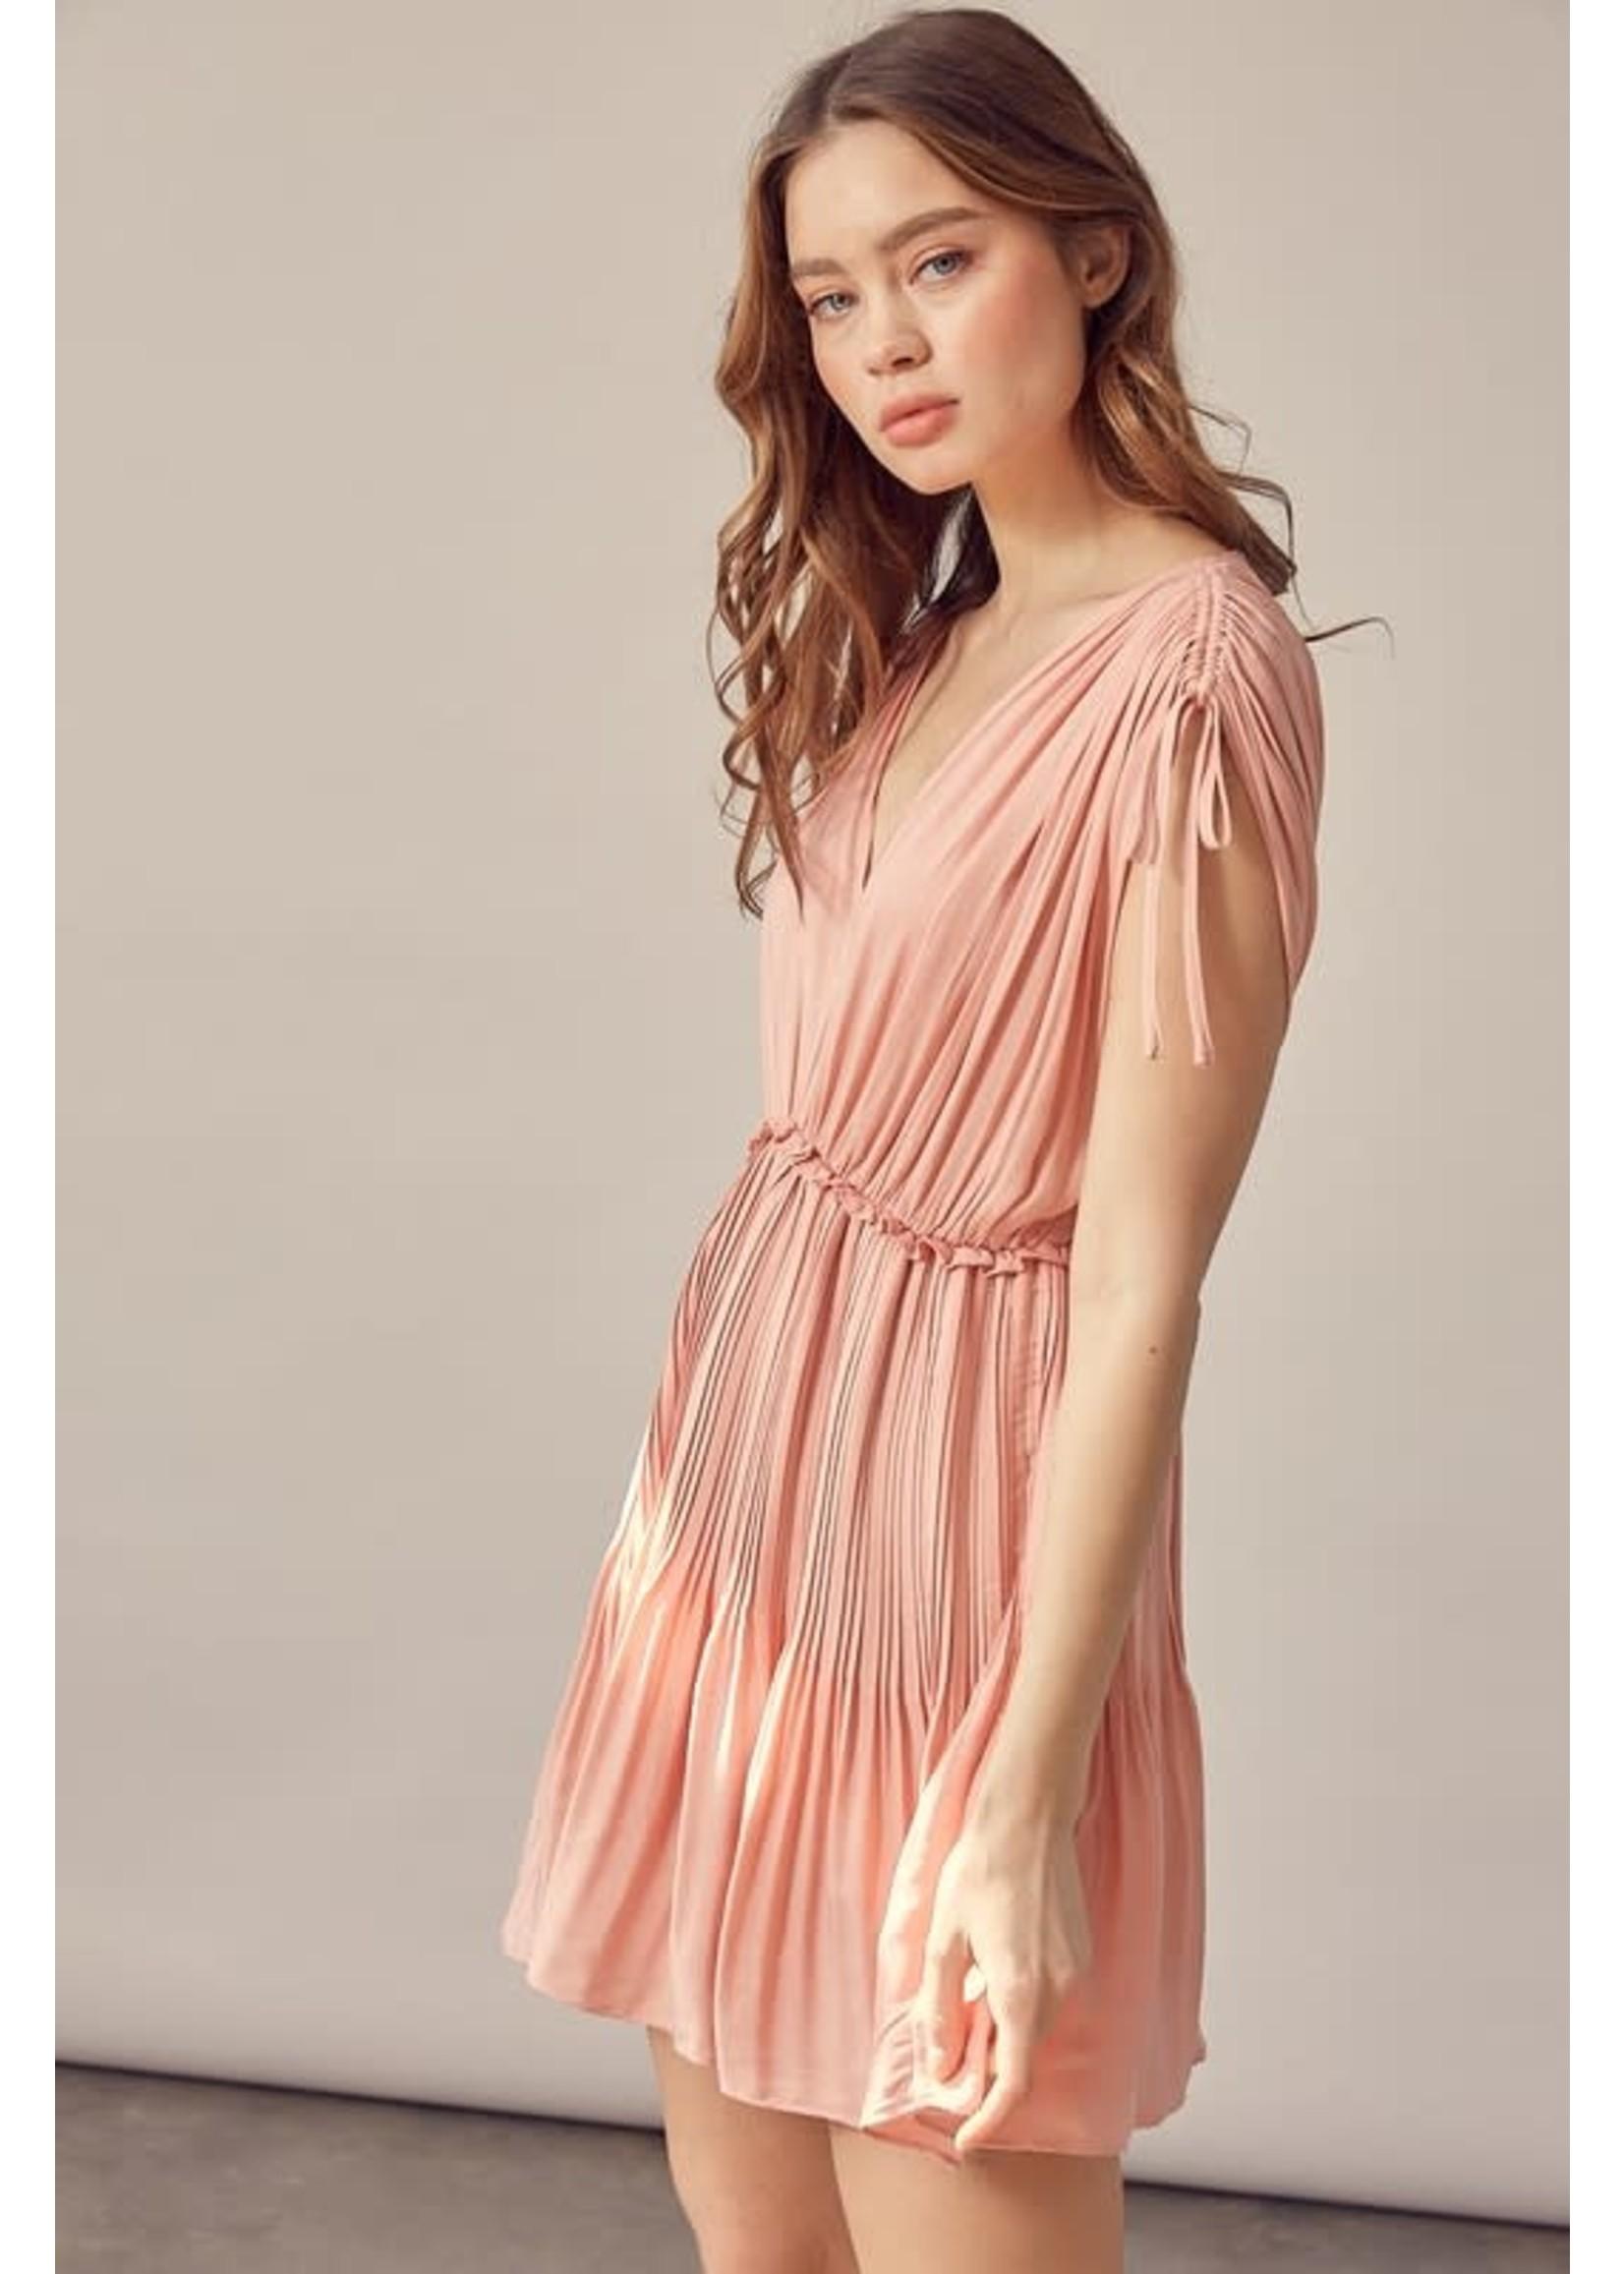 Mustard Seed Back Tying Pleated Mini Dress - S16987